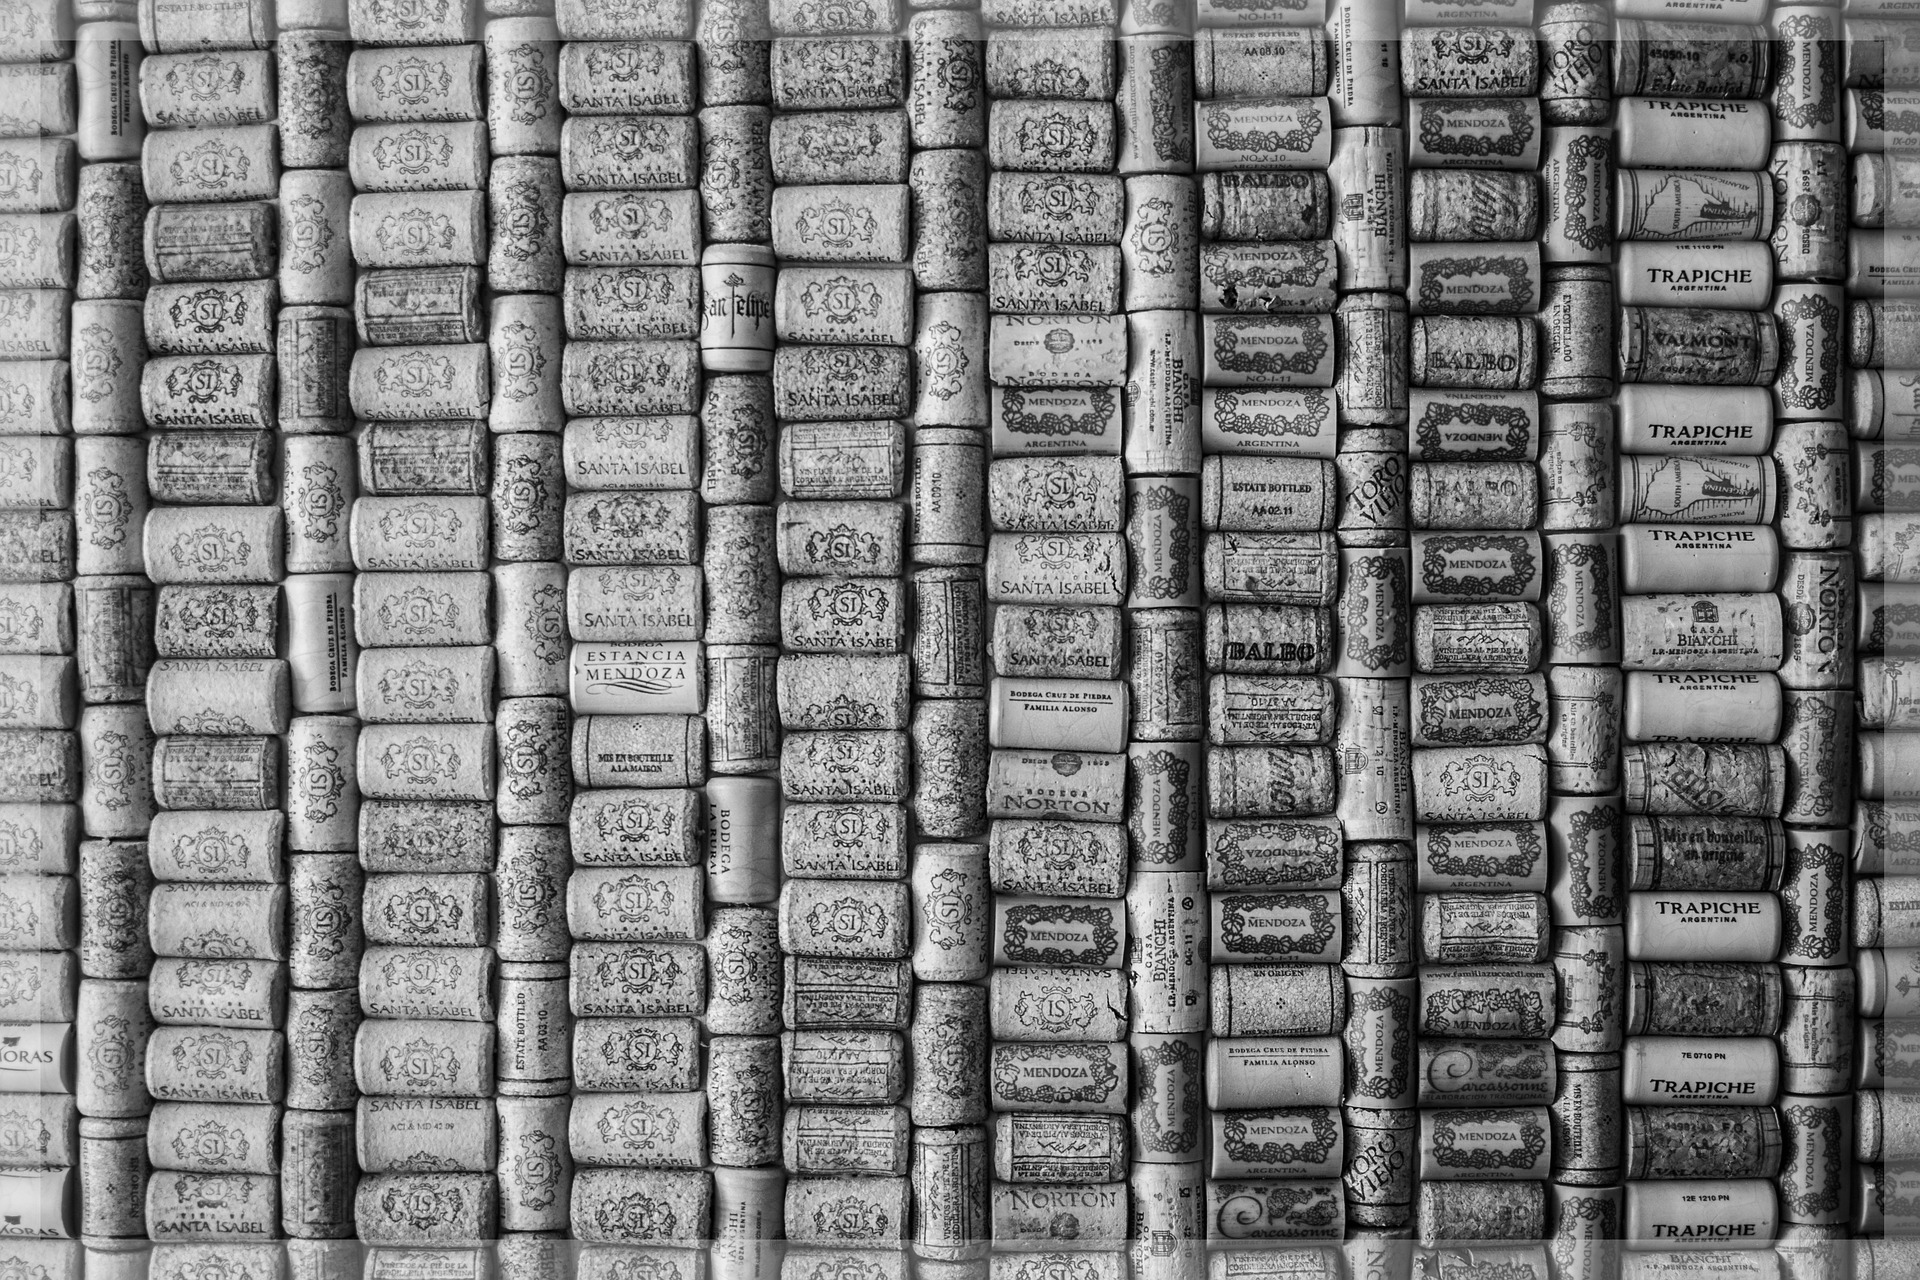 corks-970079_1920